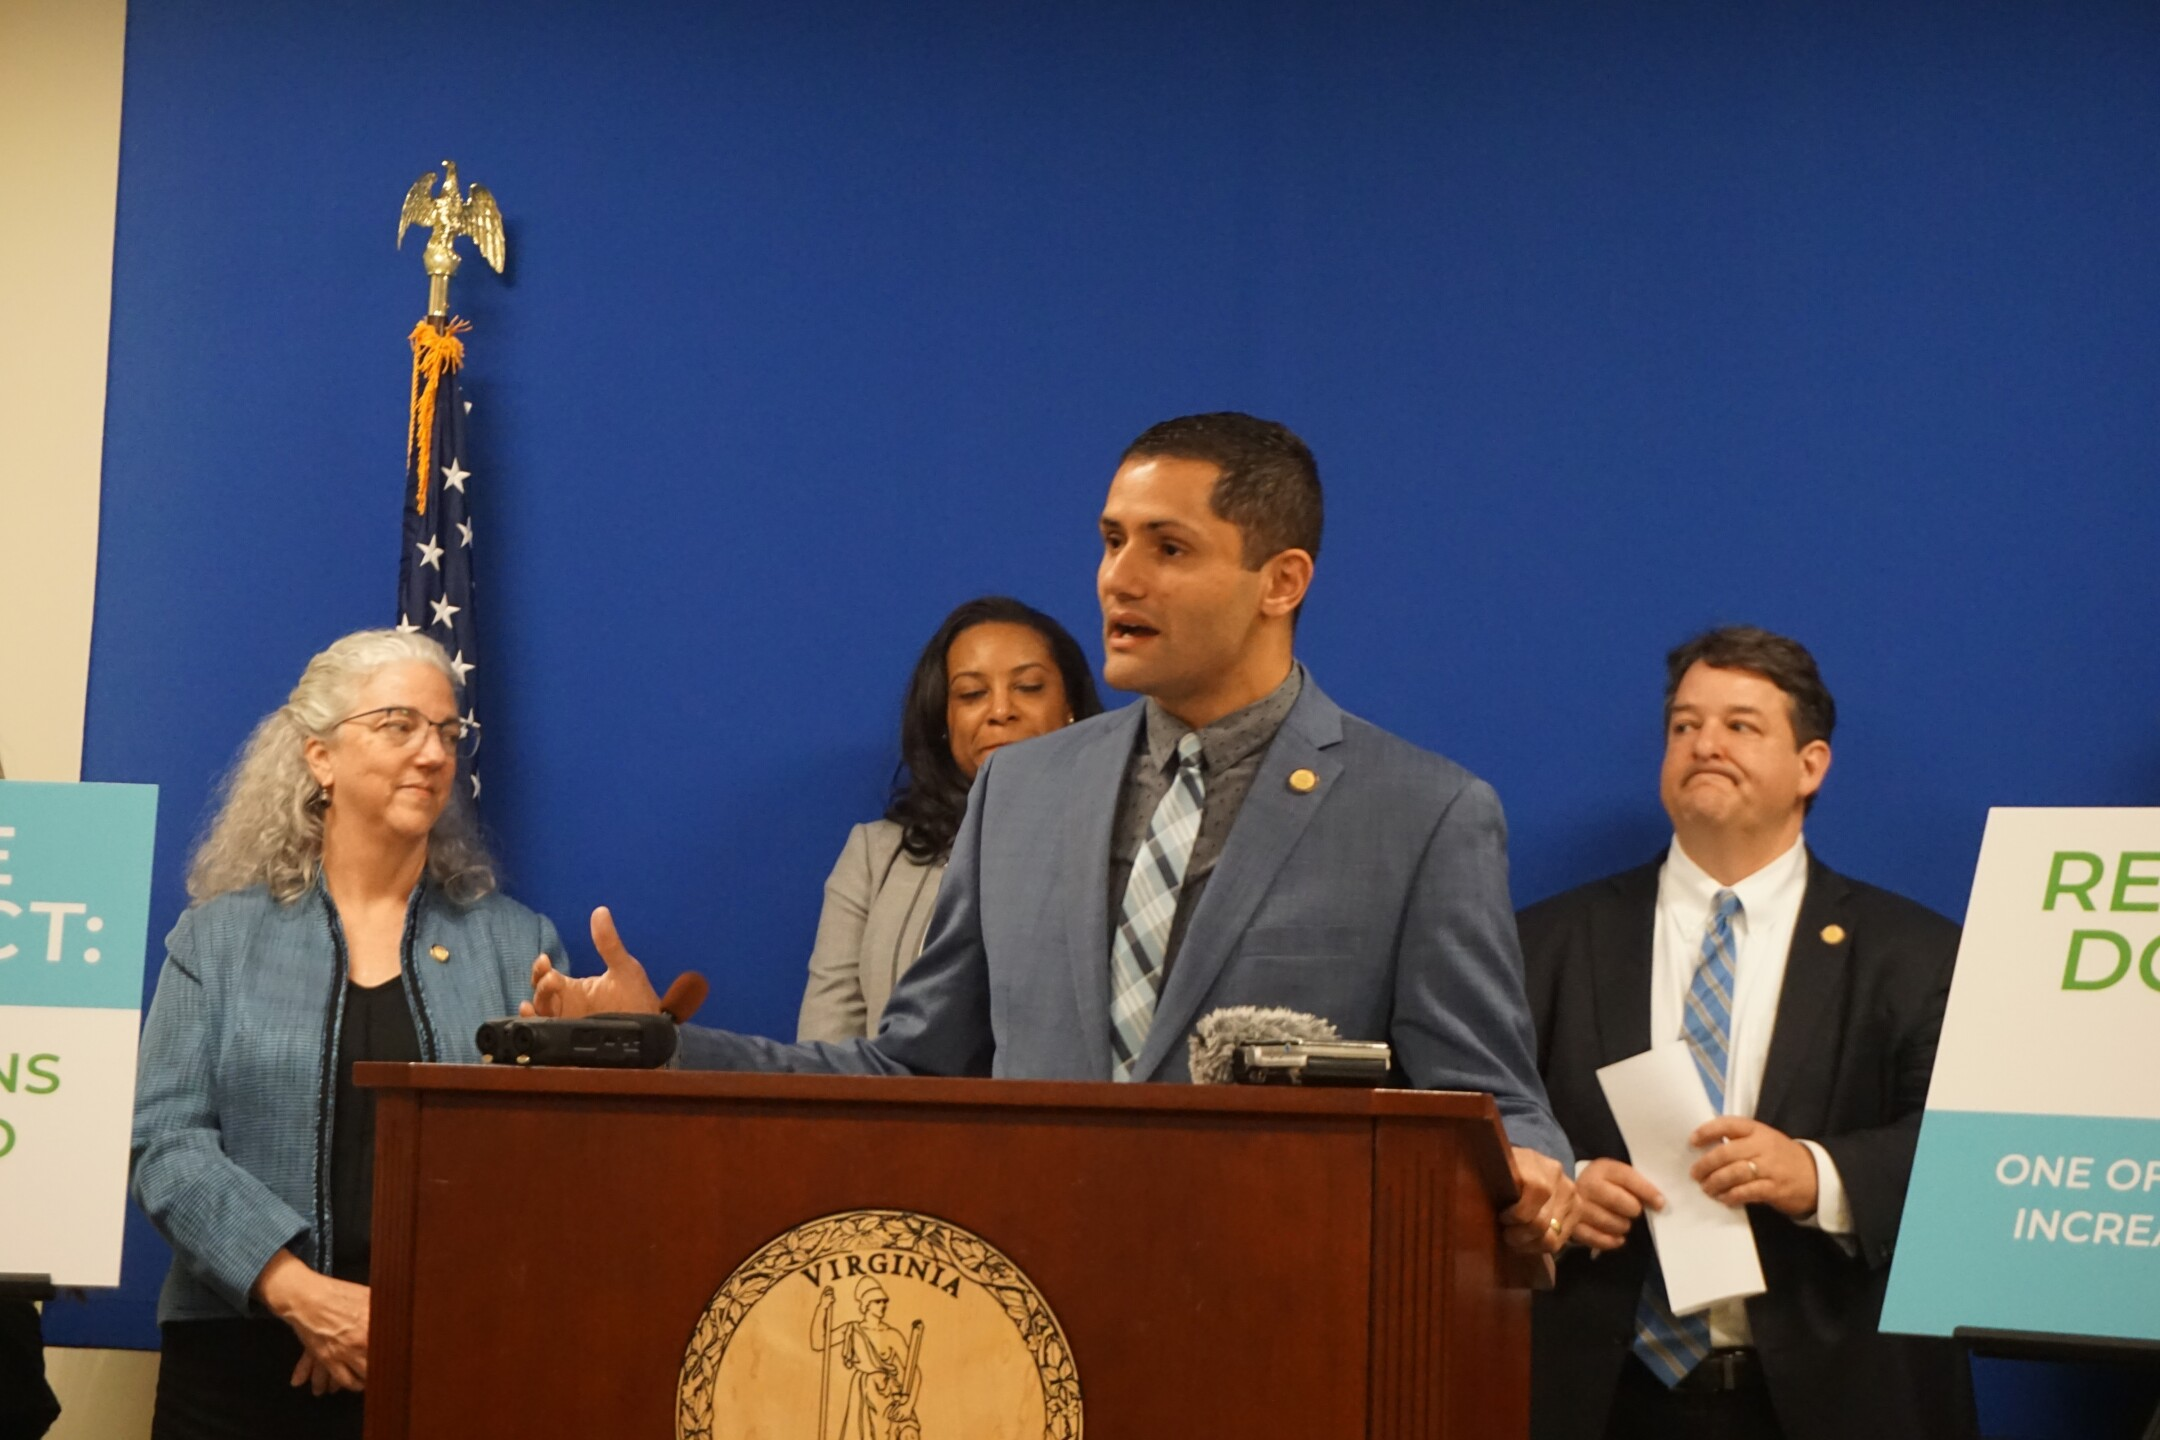 Photos: Virginia legislators seek refund for utilitycustomers